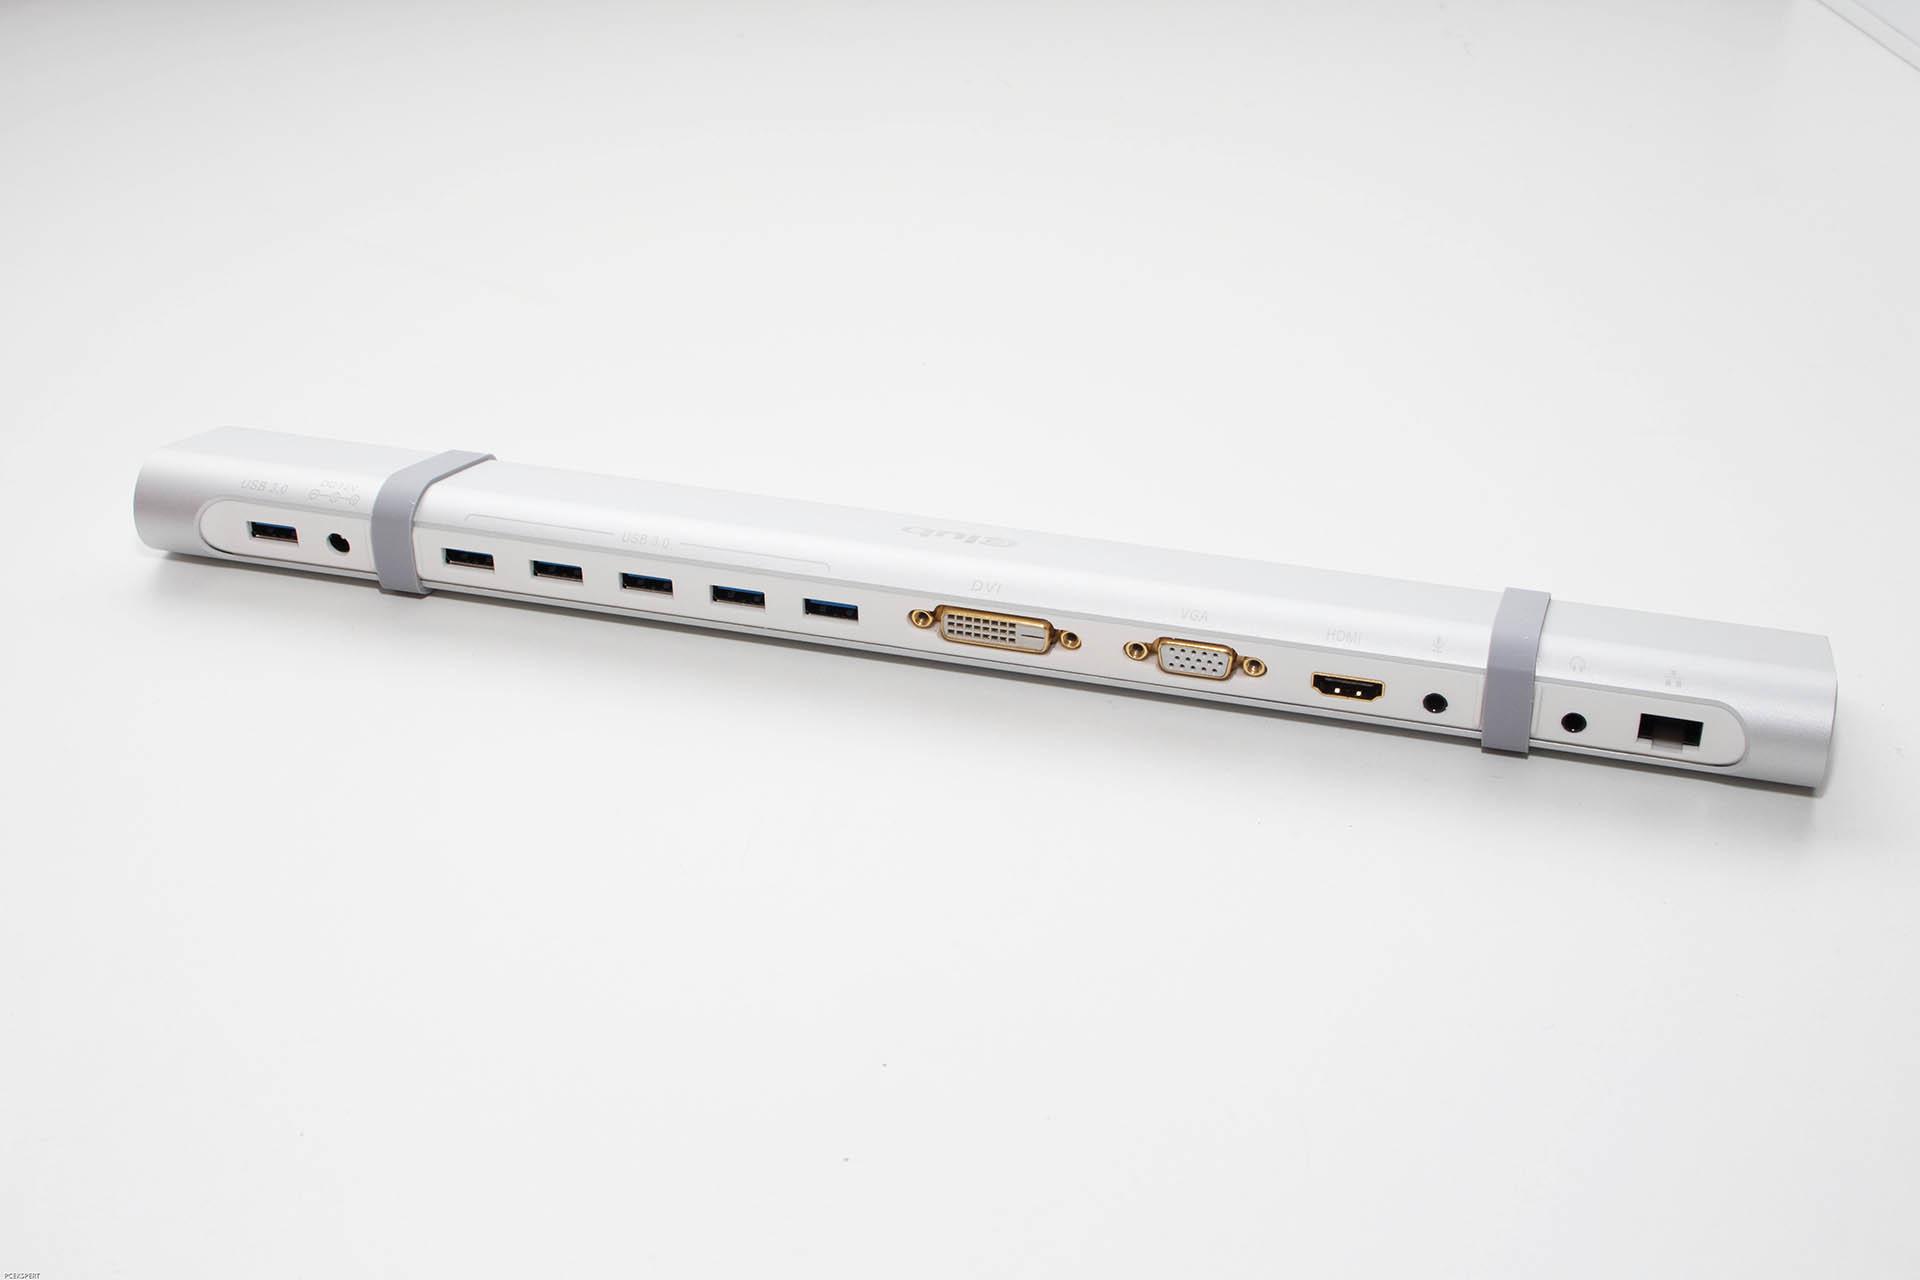 Club 3D Sense Vision USB 3.0 Ultra Smart Dock test